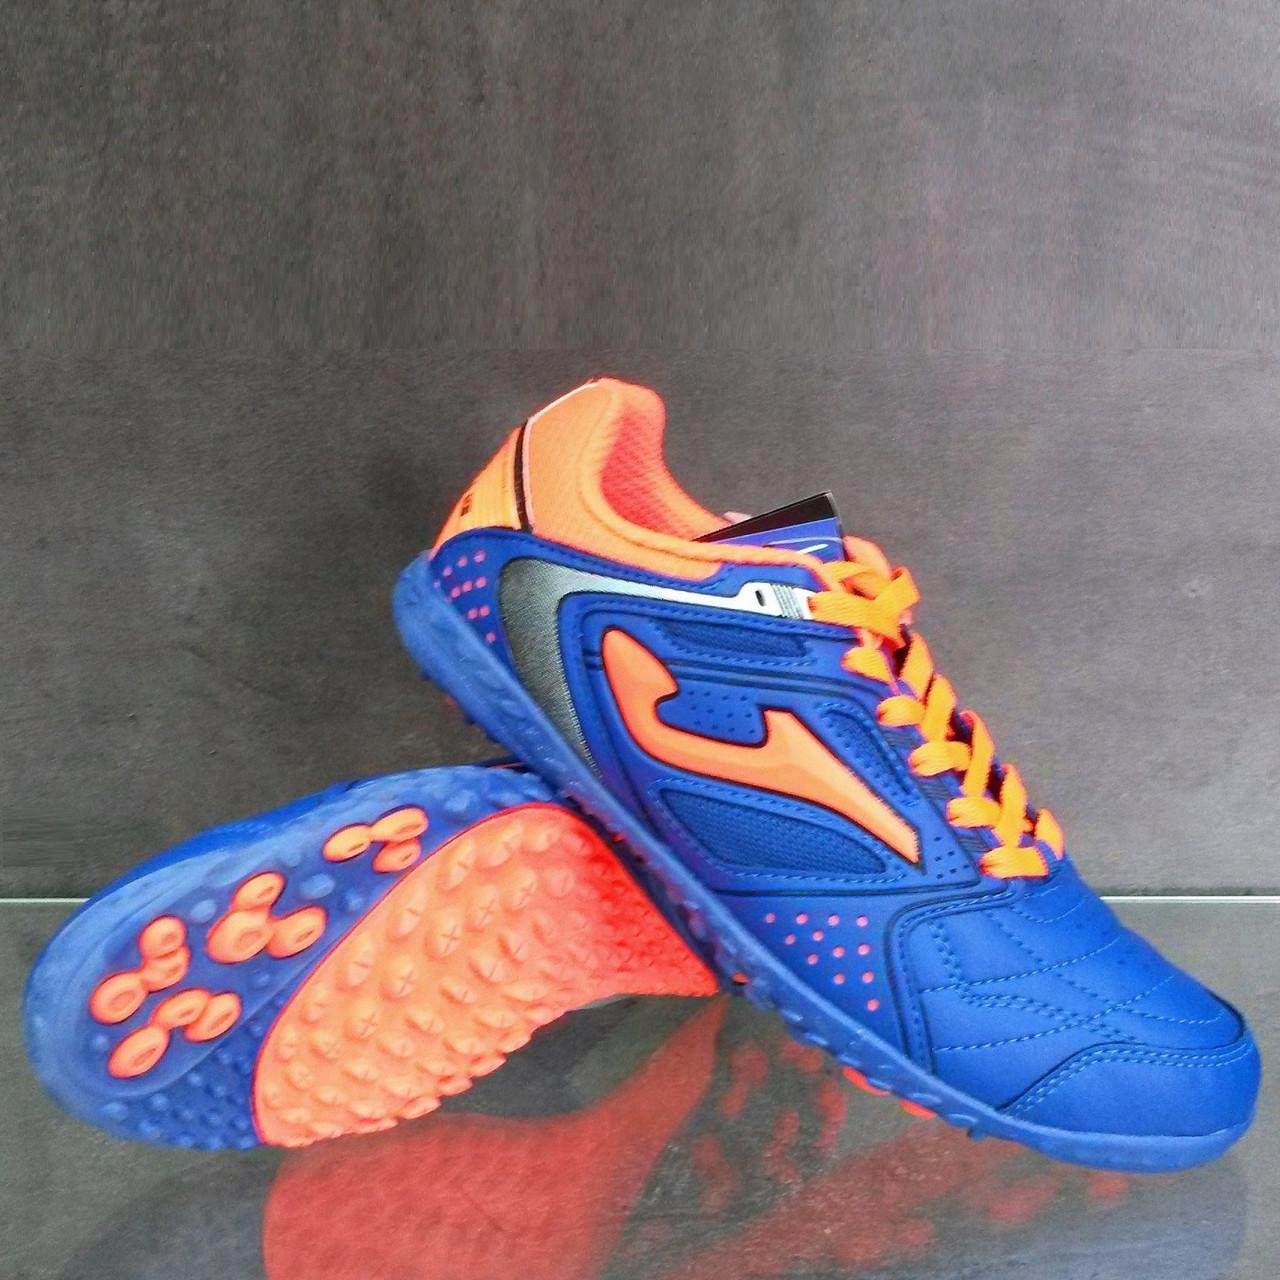 Обувь для футбола (сороканожки) Joma Dribling 404 PT